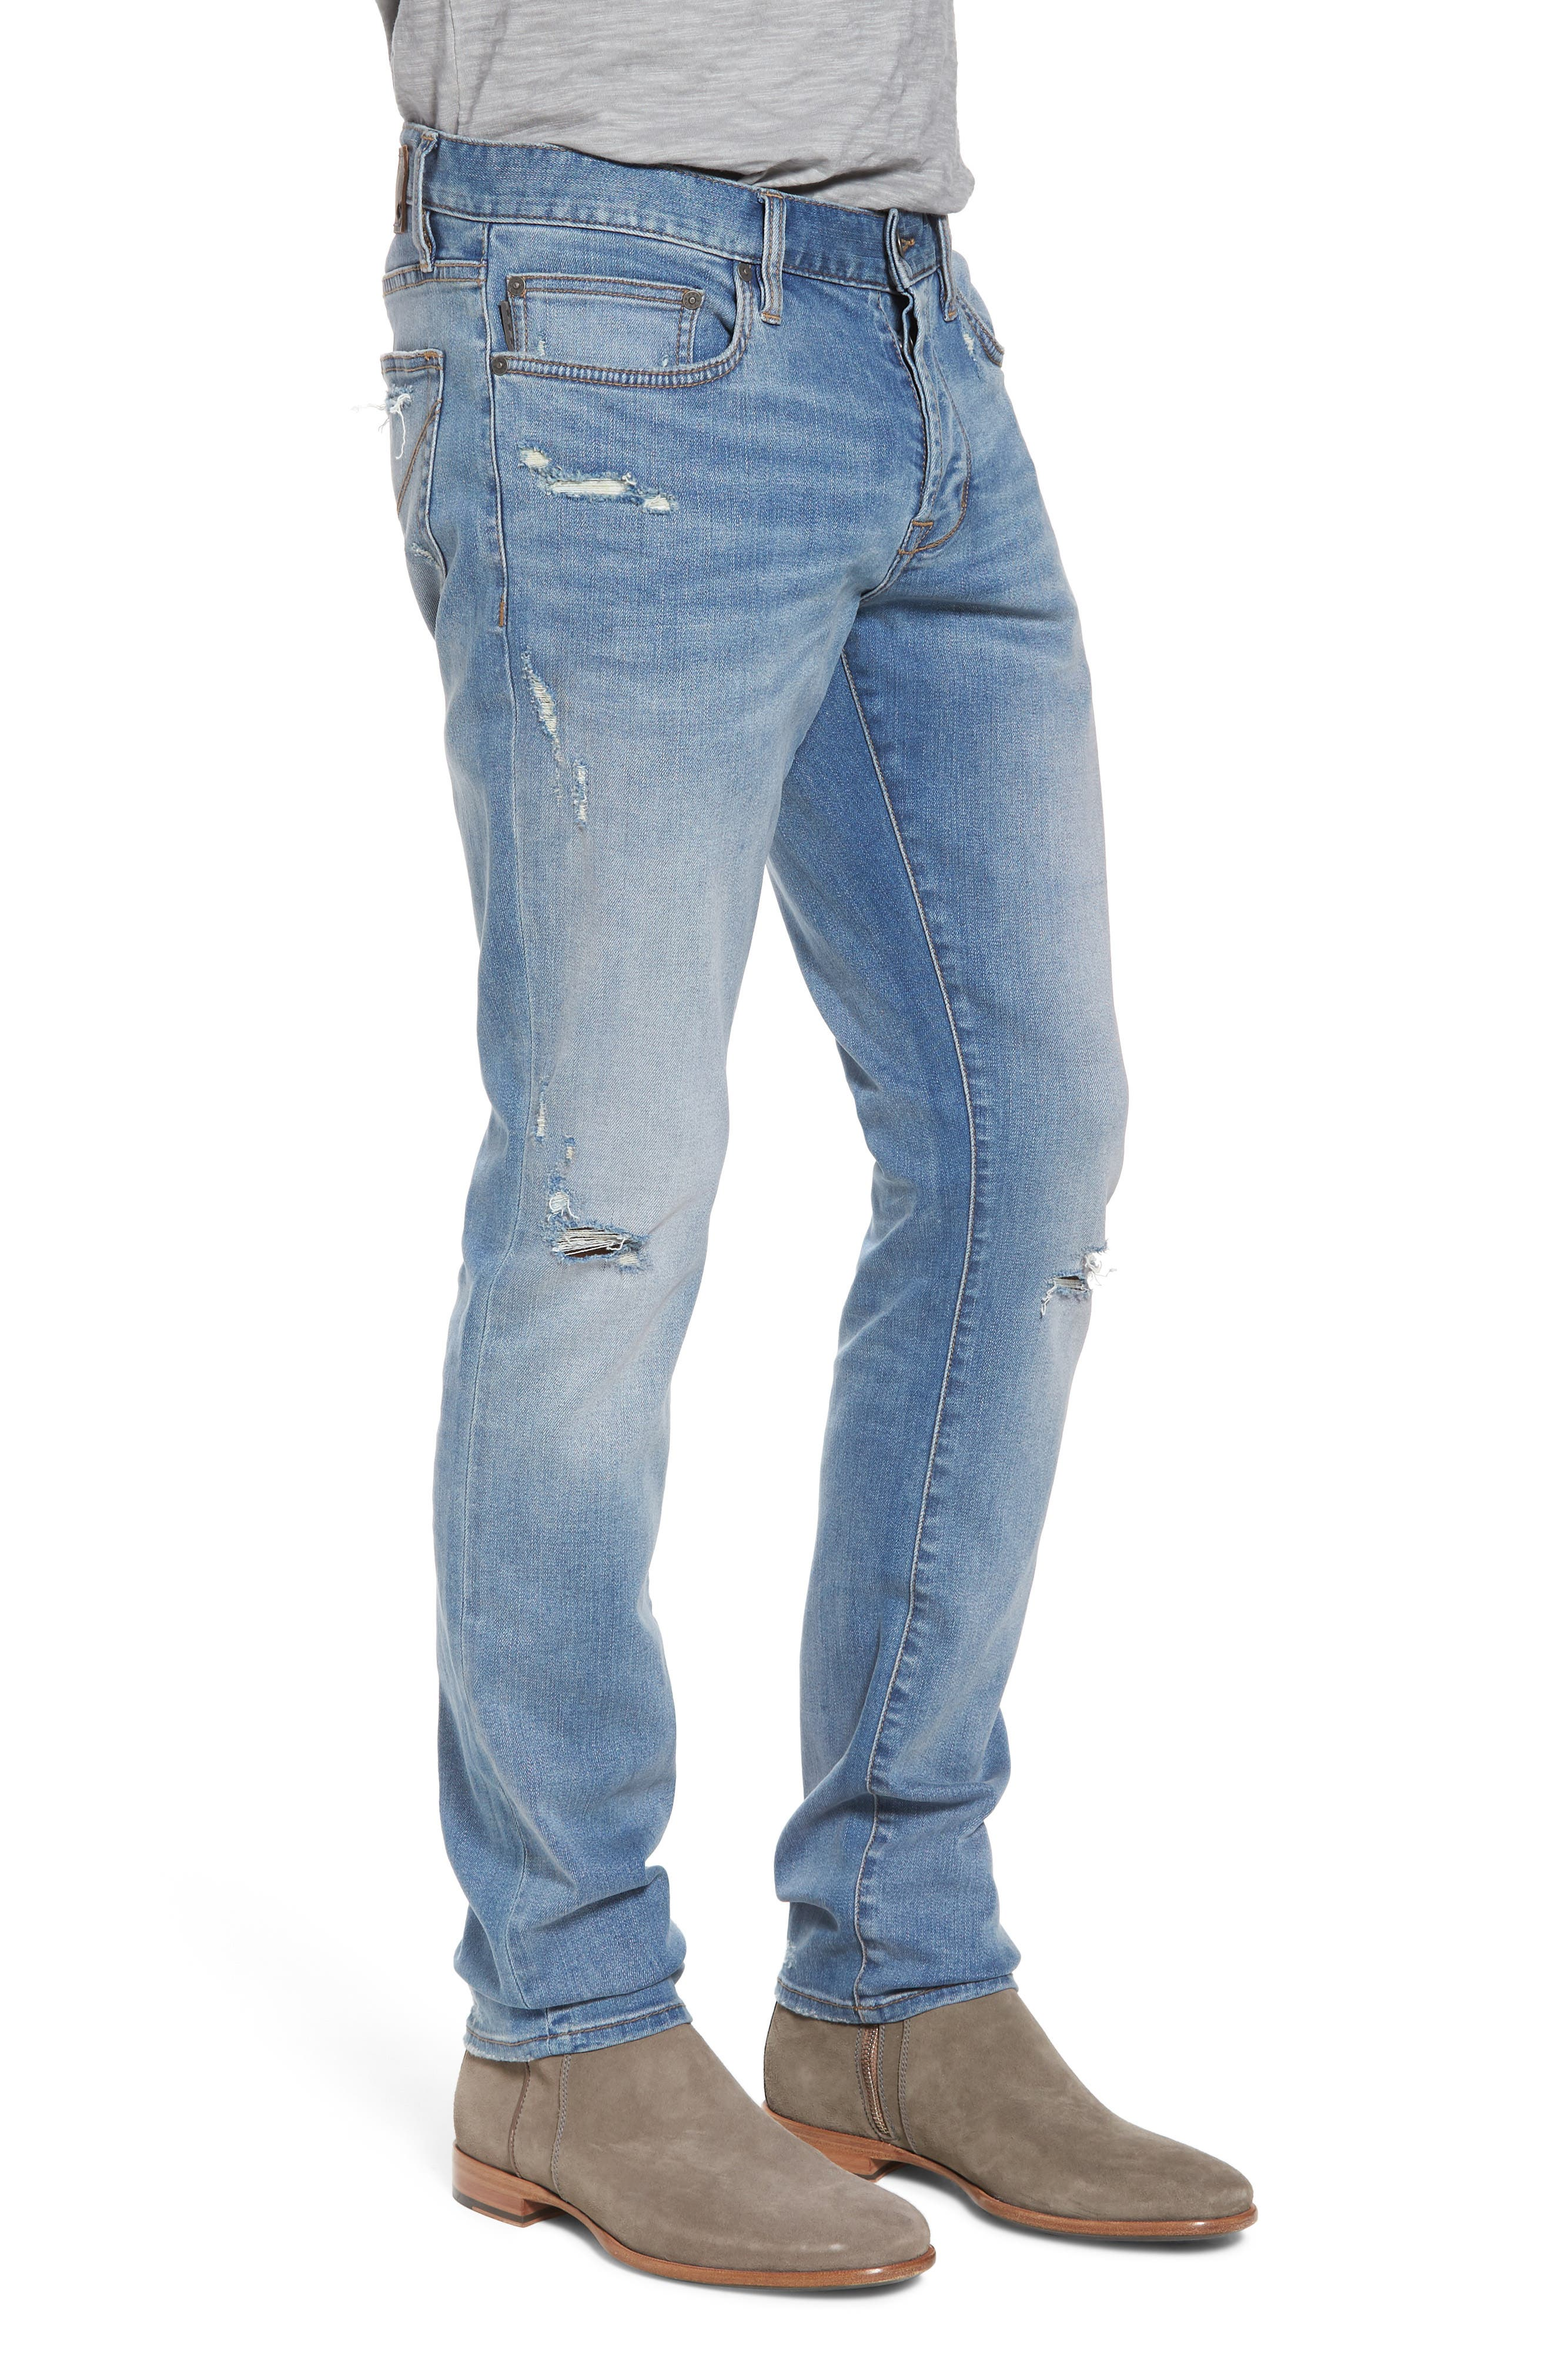 Wight Slim Fit Straight Leg Jeans,                             Alternate thumbnail 3, color,                             Atlantic Blue